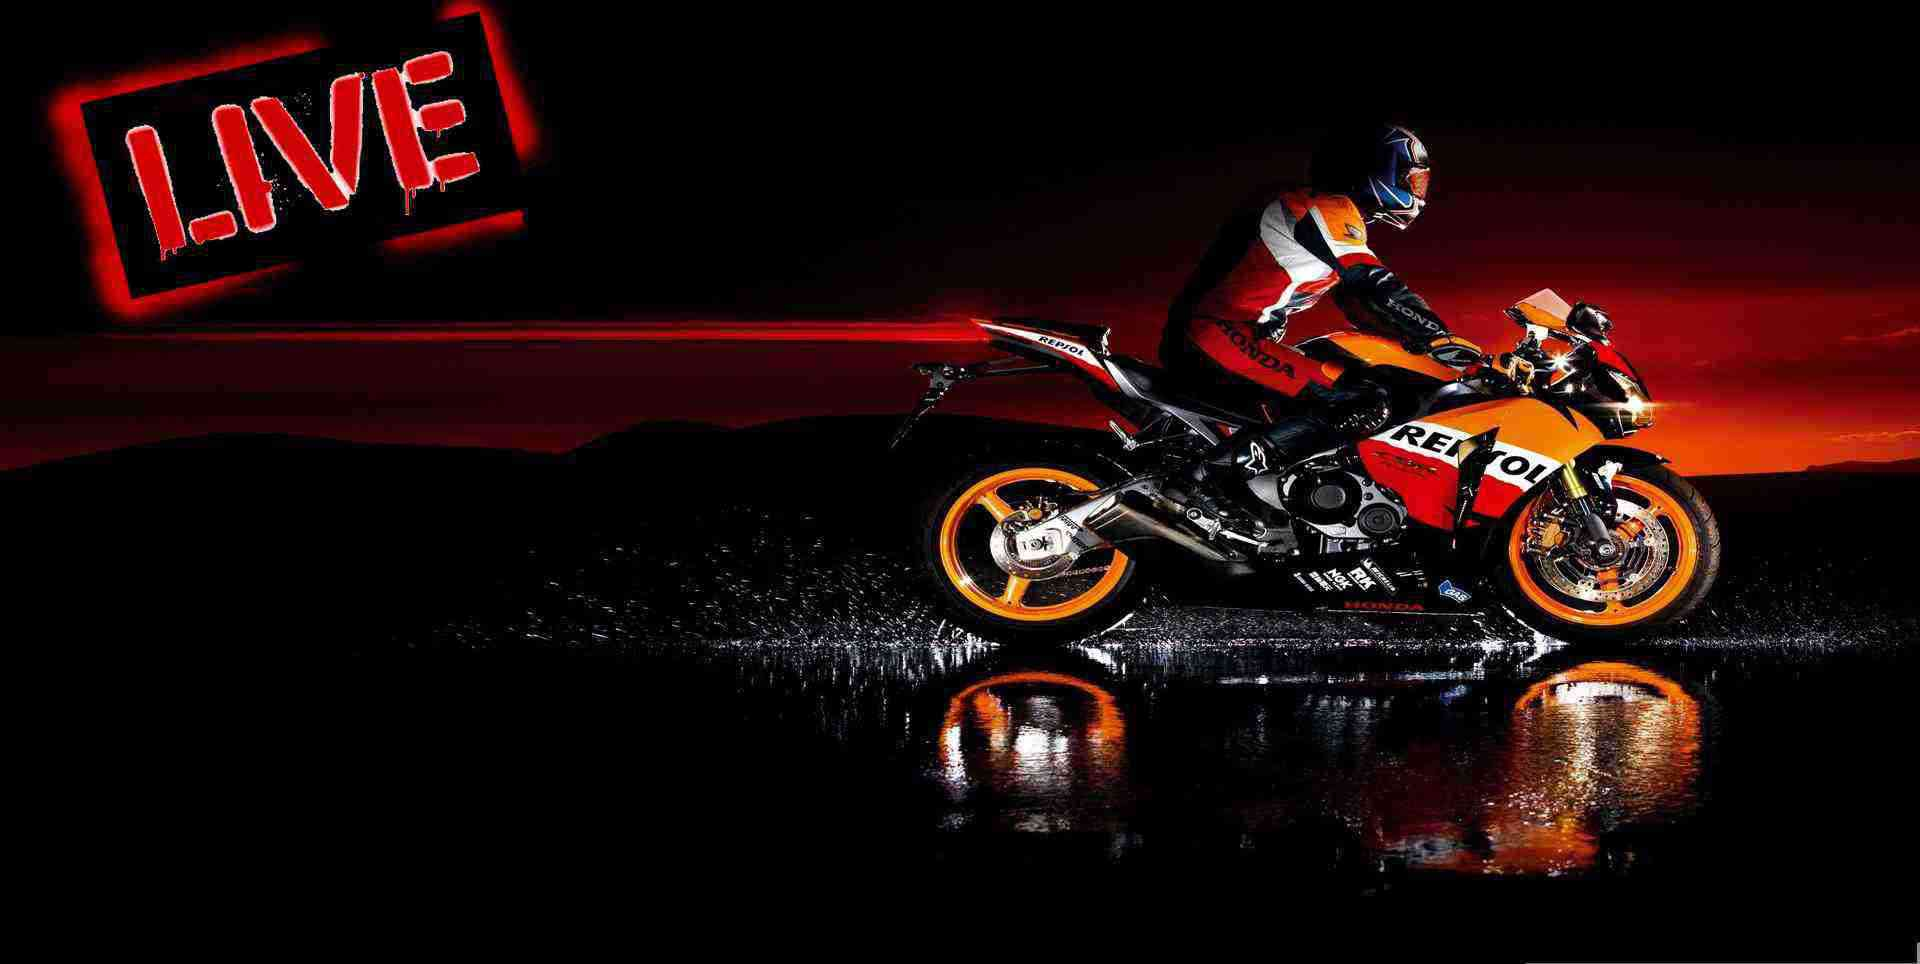 2016-austrian-motogp-grand-prix-live